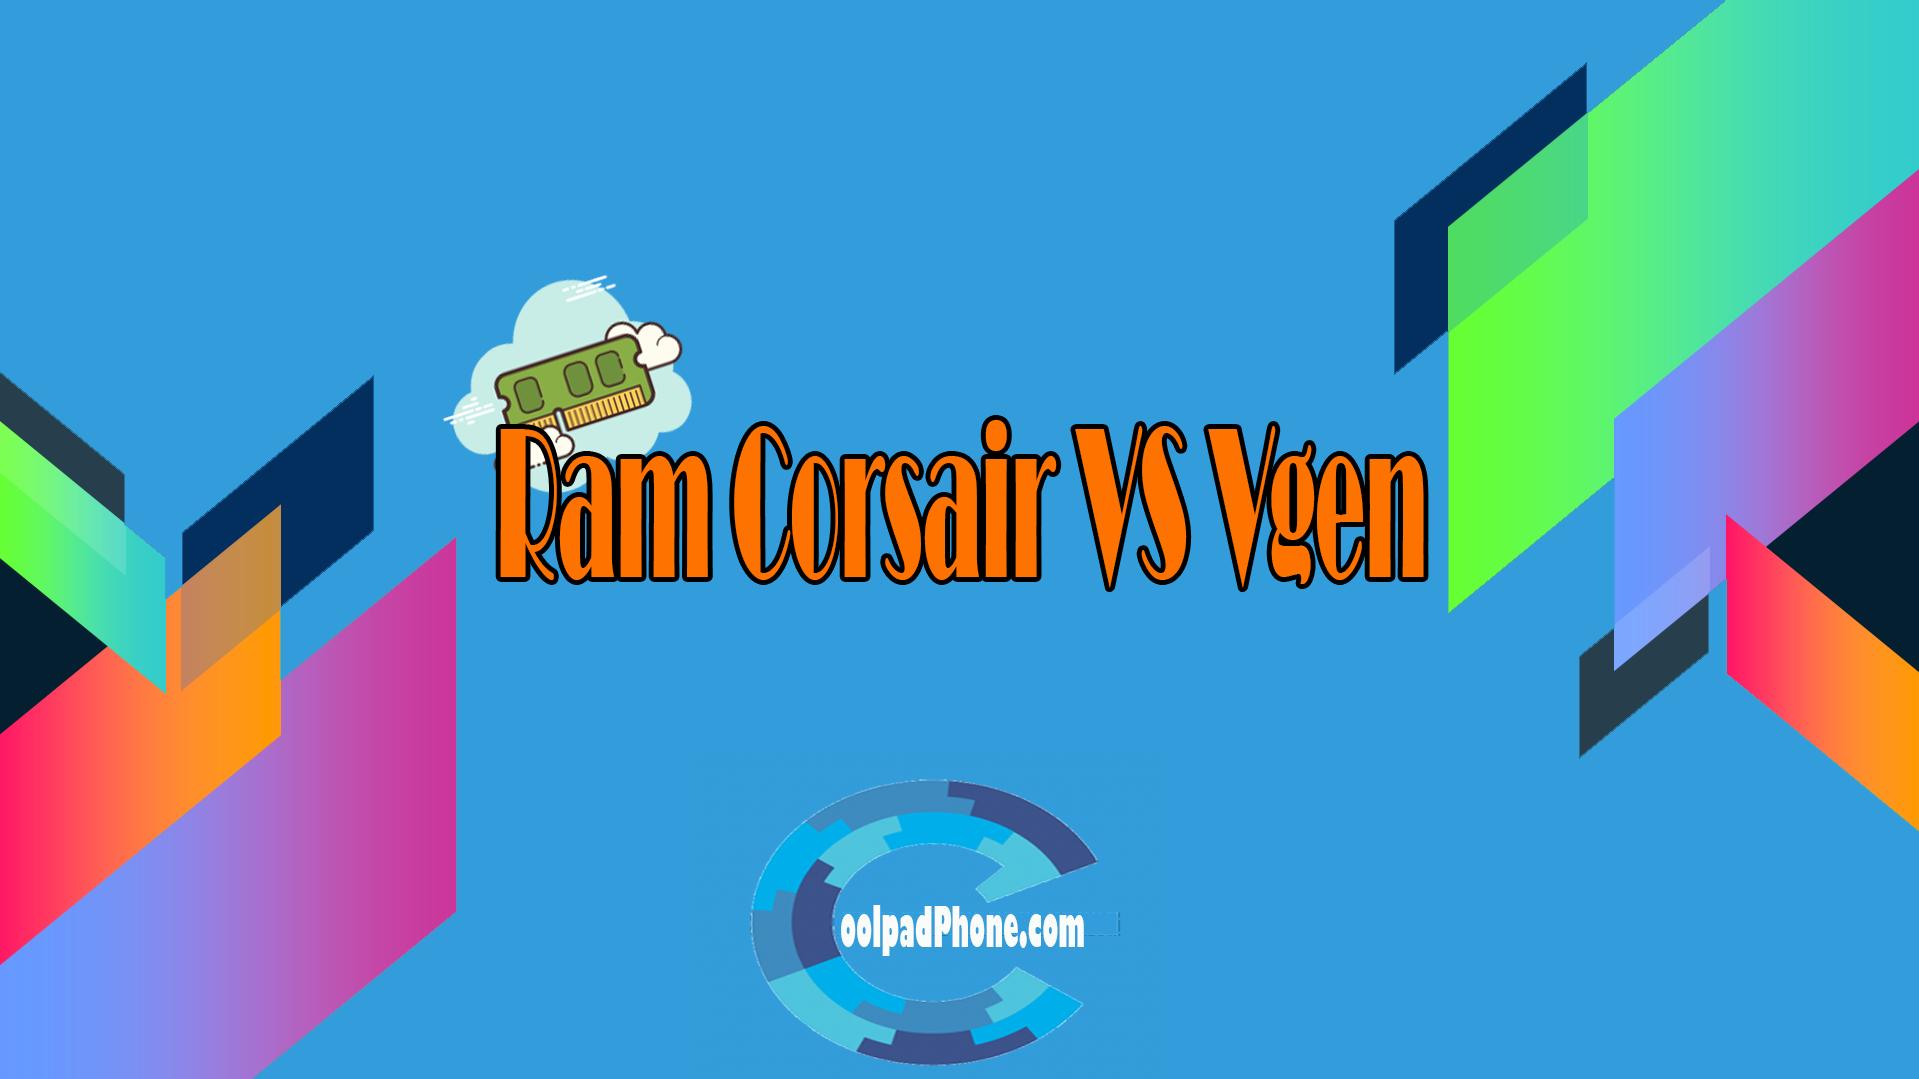 Ram Corsair VS Vgen